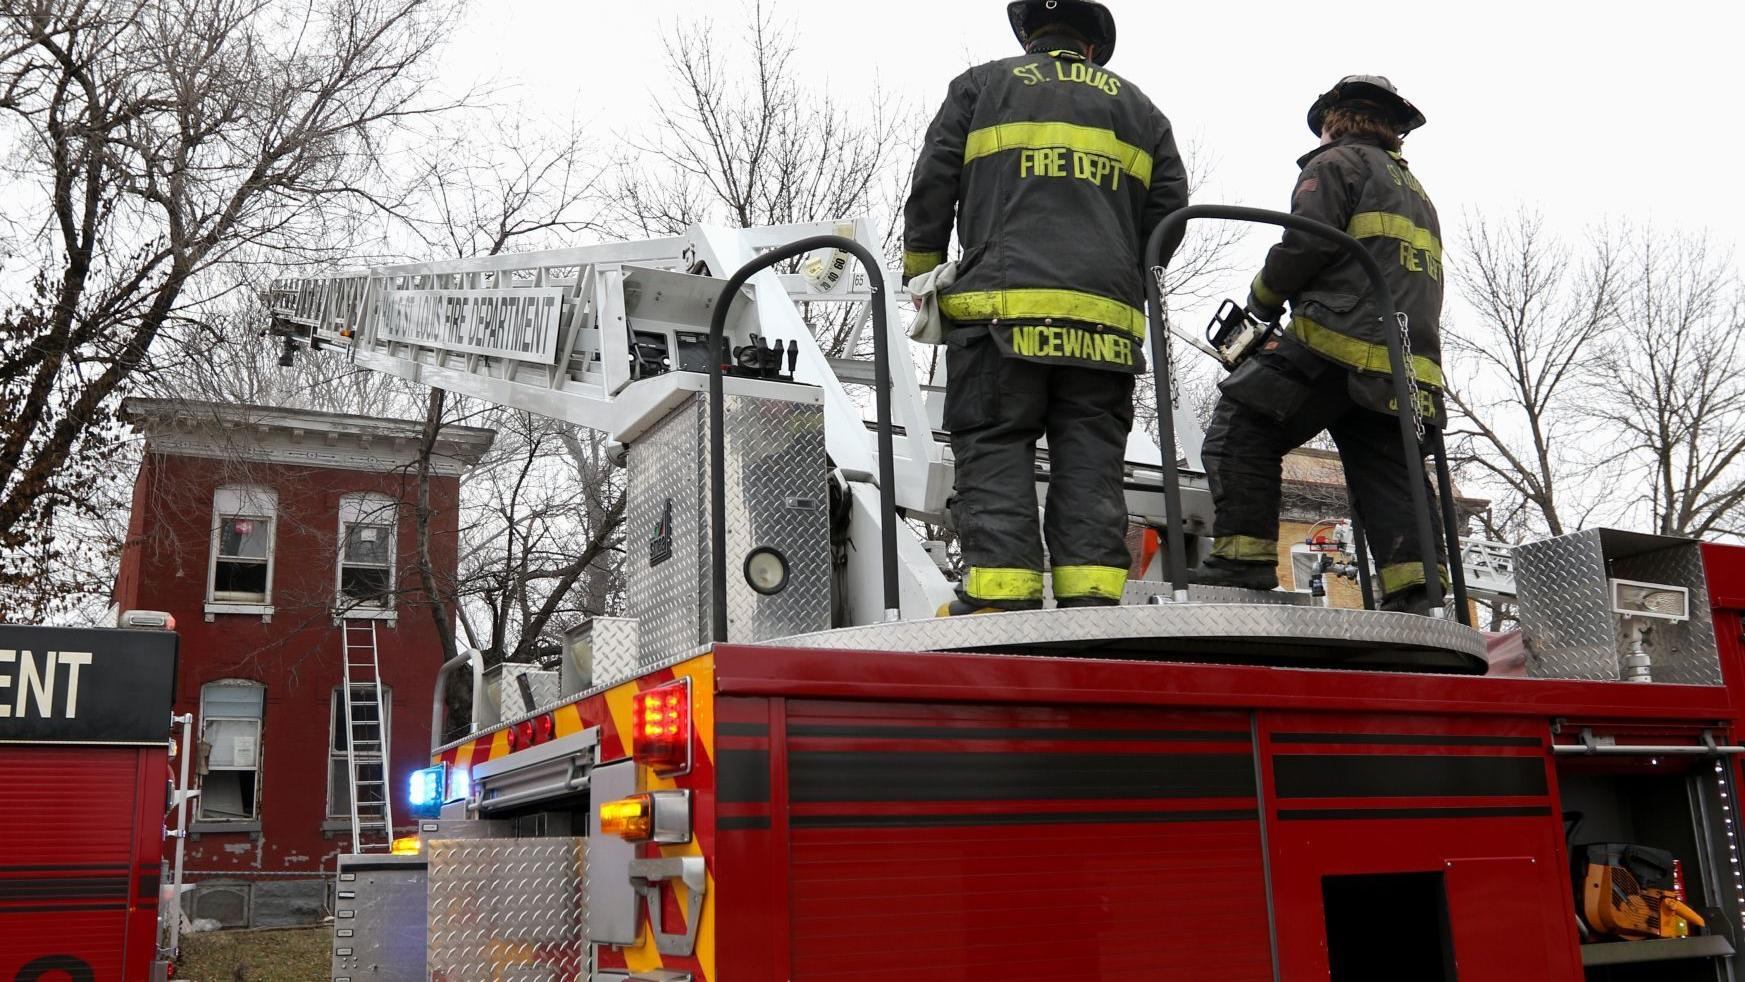 St. Louis aldermen advance firefighter union-backed bill undoing some pension reforms